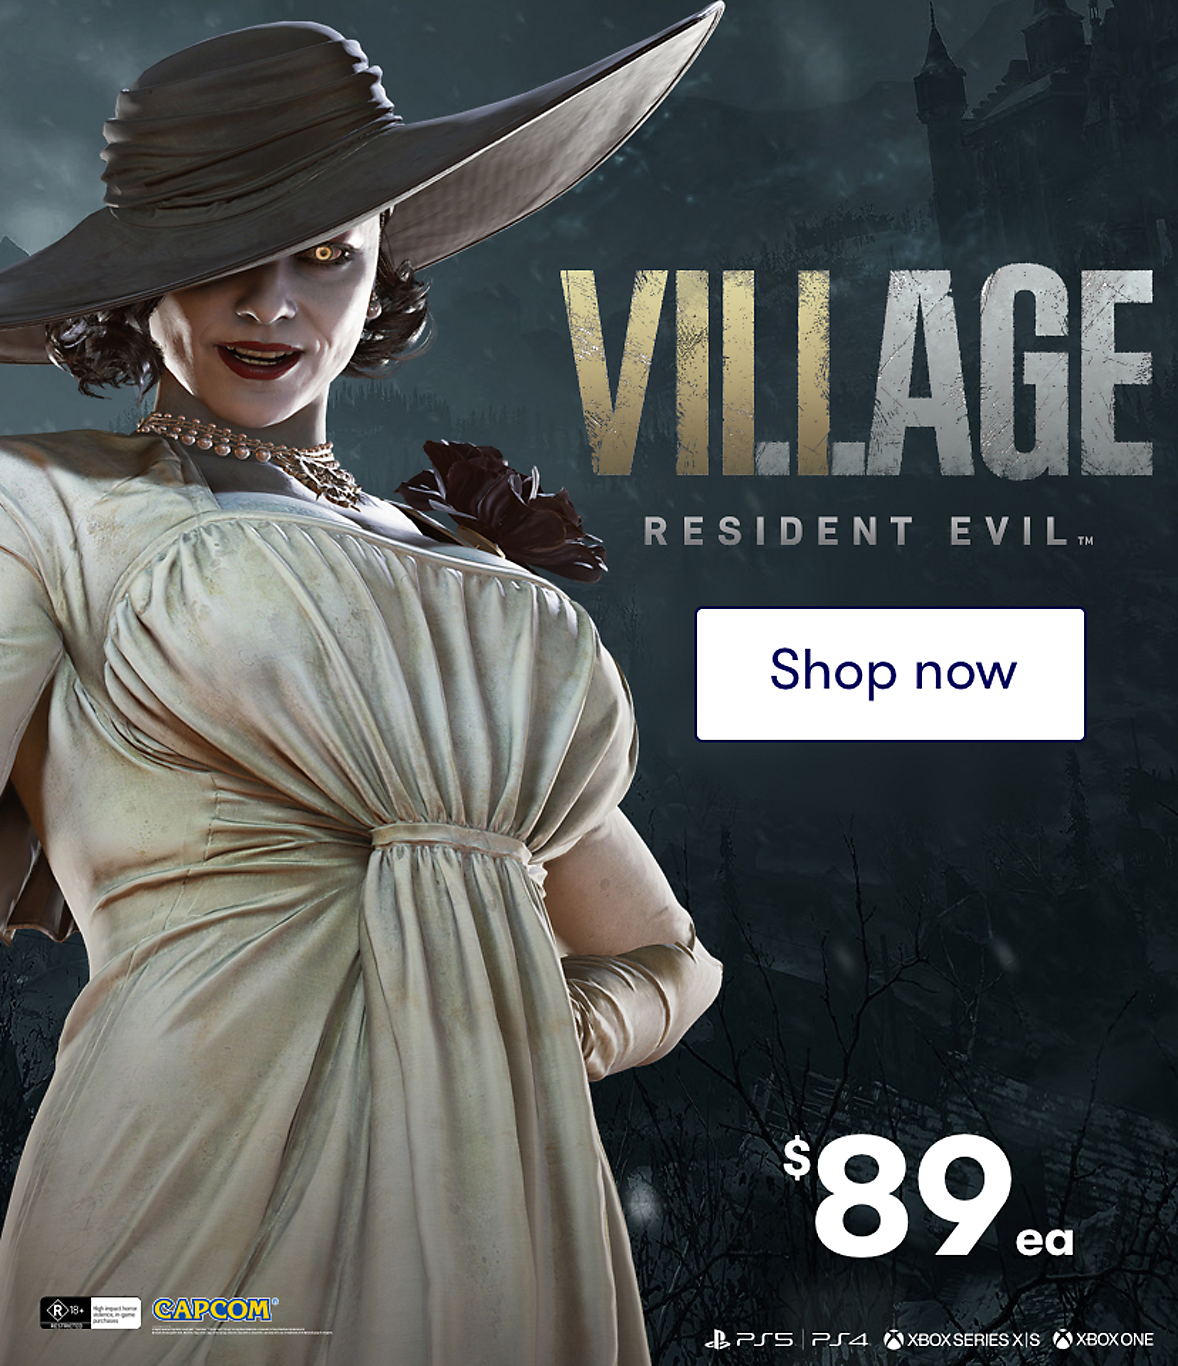 Resident Evil VIII Village